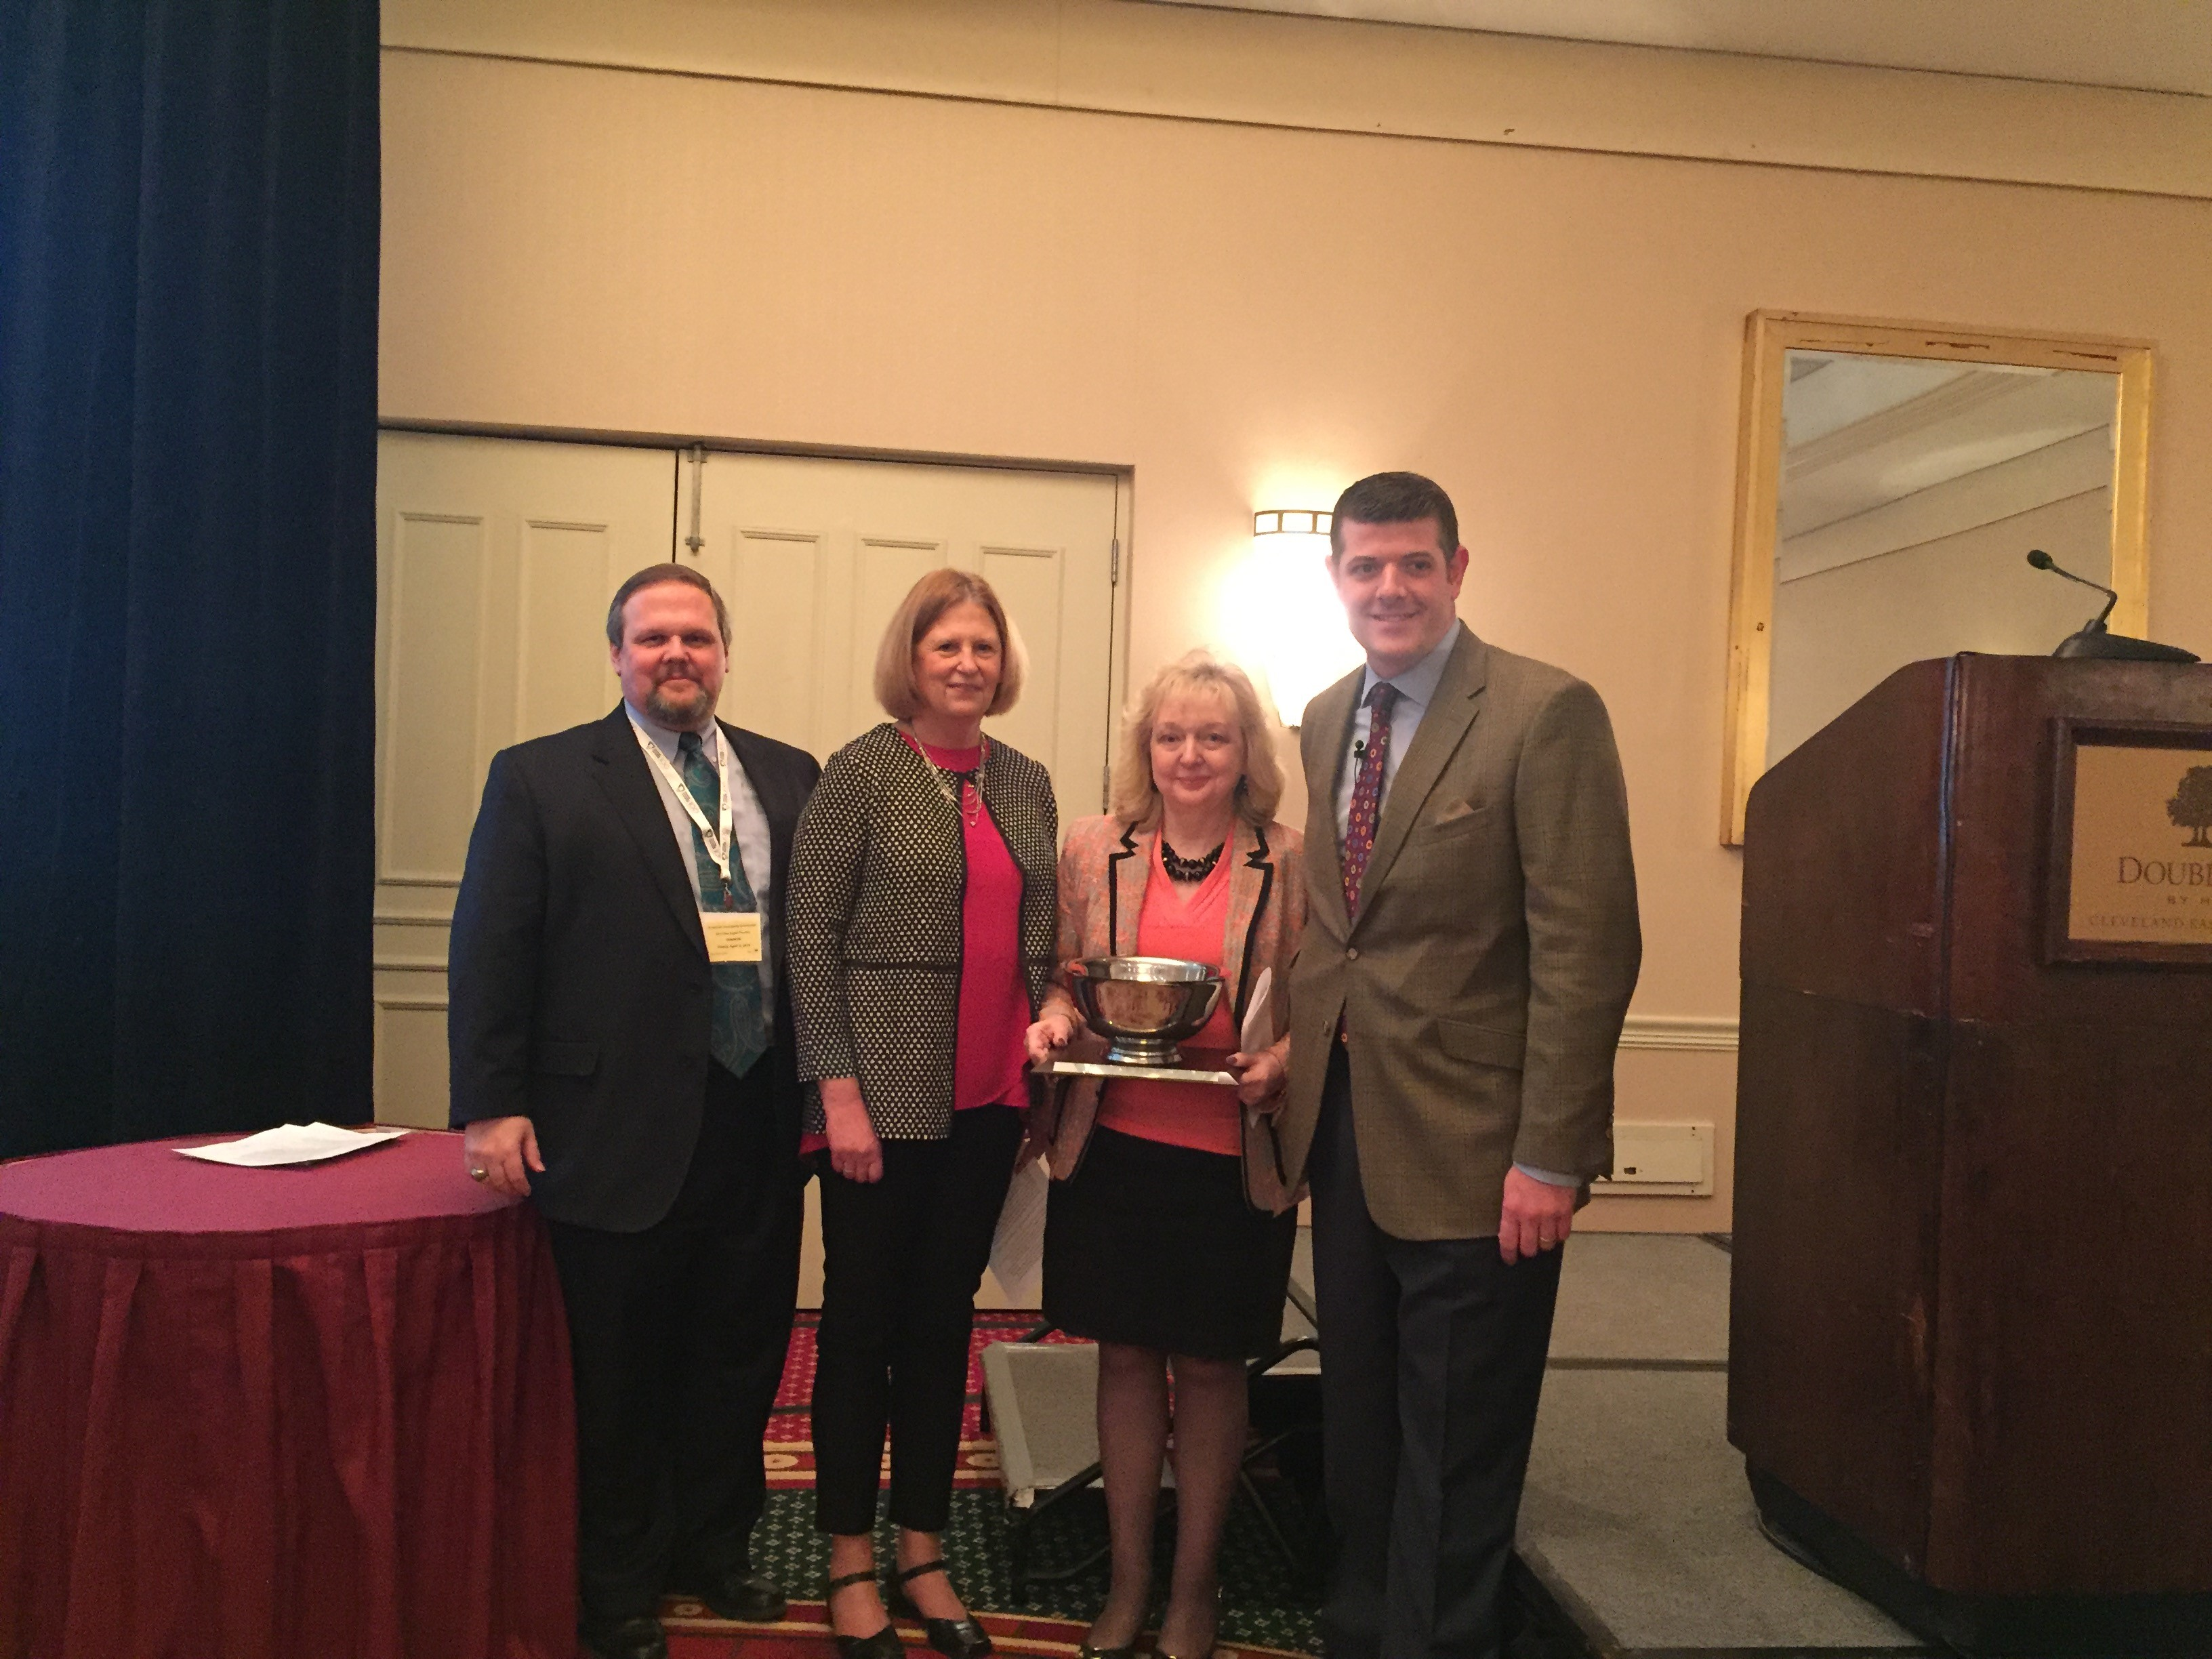 Dr. Heidi Meier Named 2016 Outstanding Ohio Accounting Educator